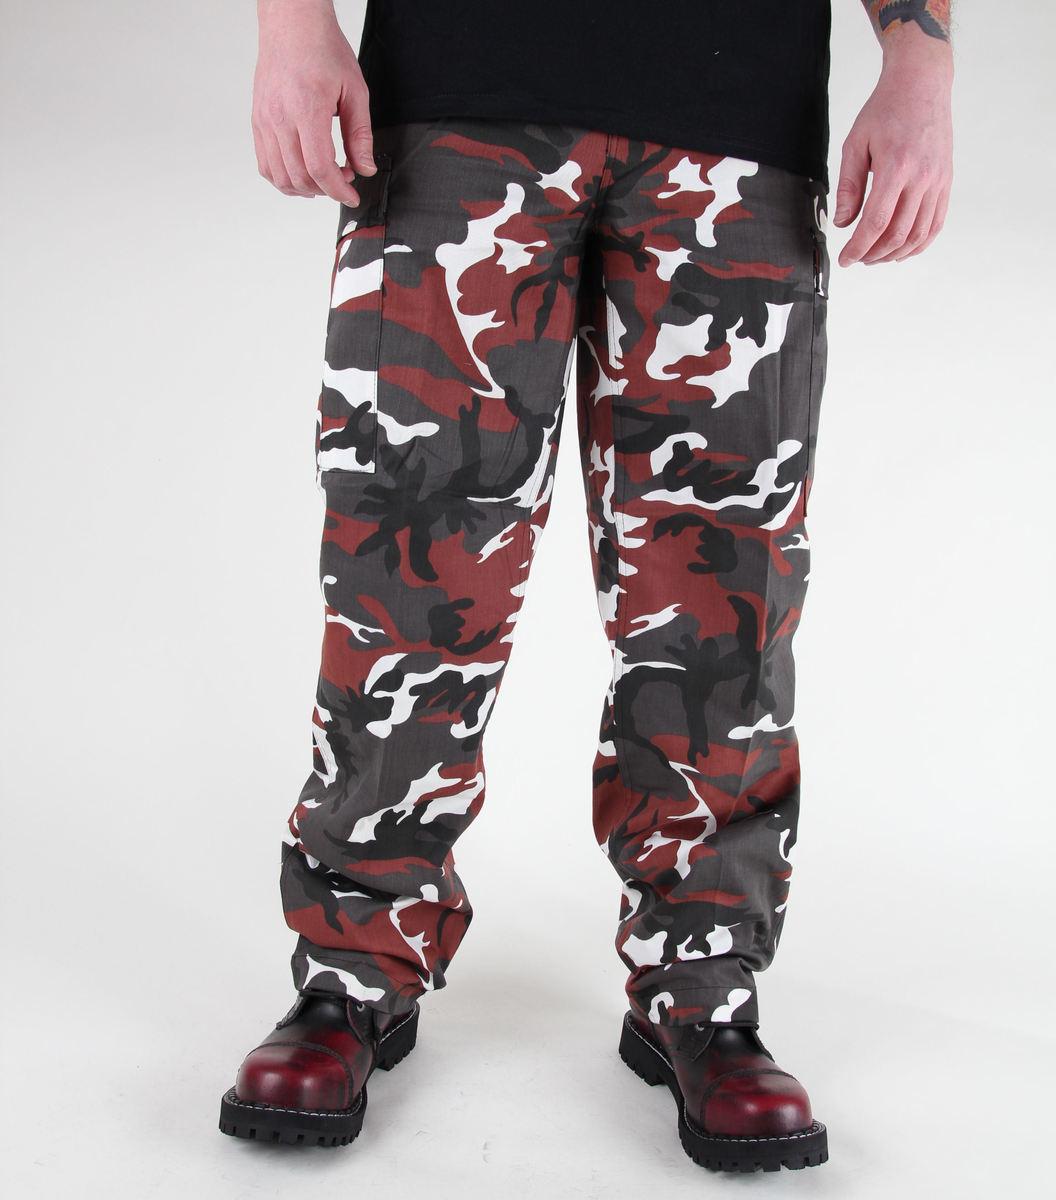 kalhoty pánské MIL-TEC - US Ranger Hose - BDU Red Camo - 11810082